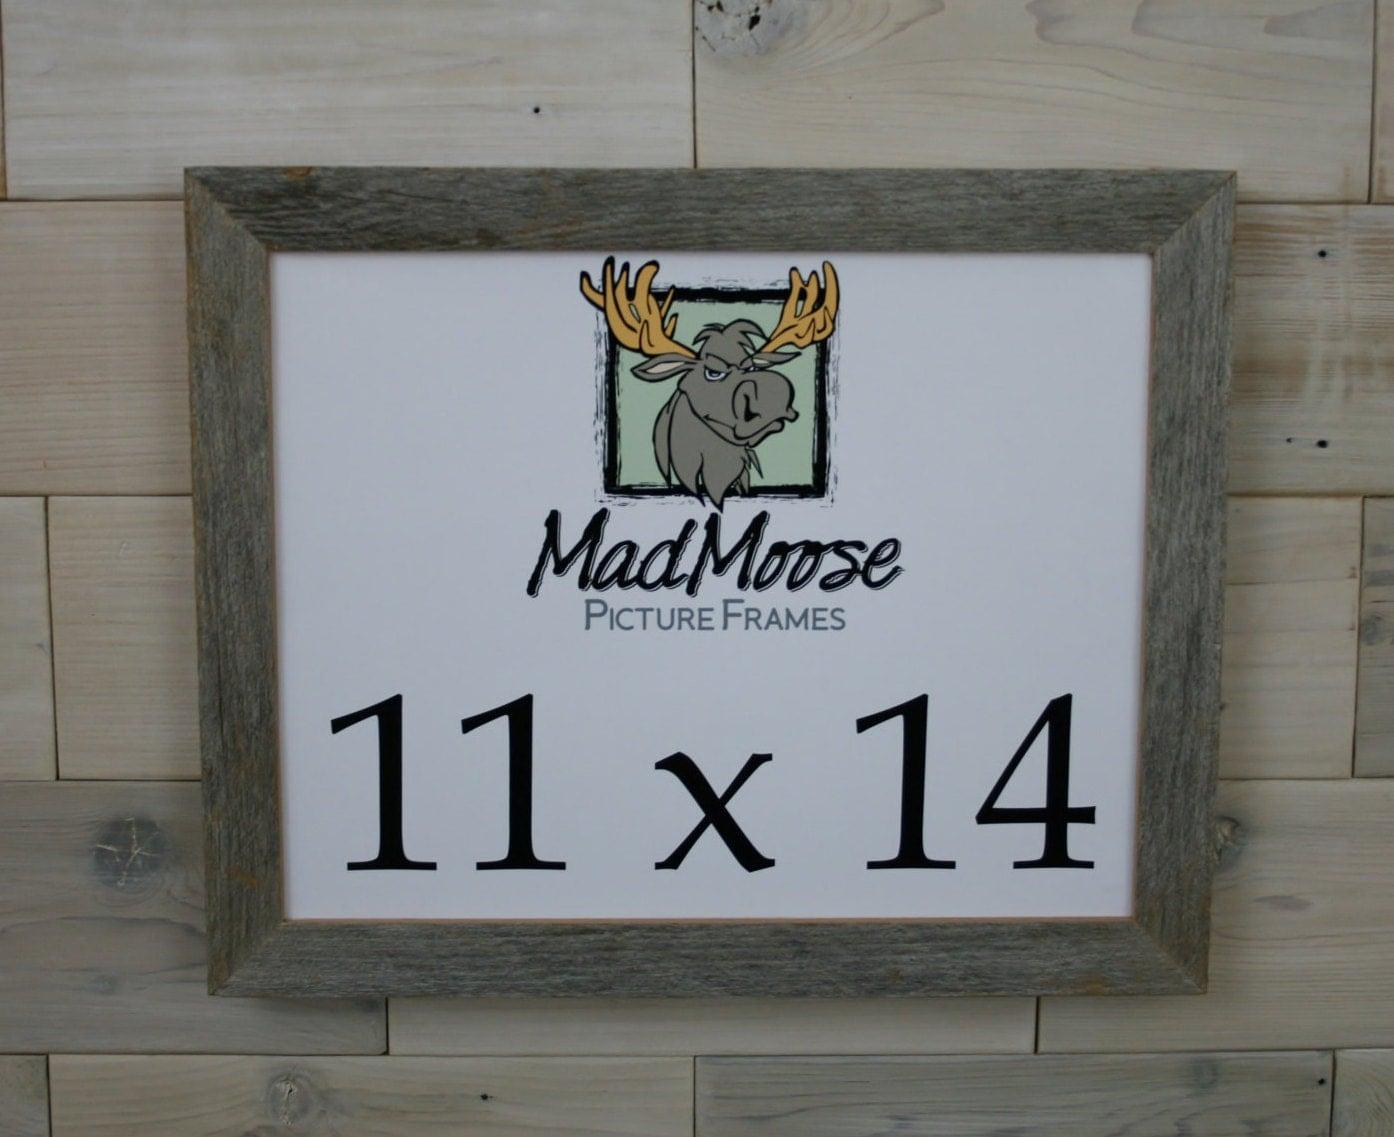 Asombroso 11 X 14 Cuadros Fotos - Ideas Personalizadas de Marco de ...